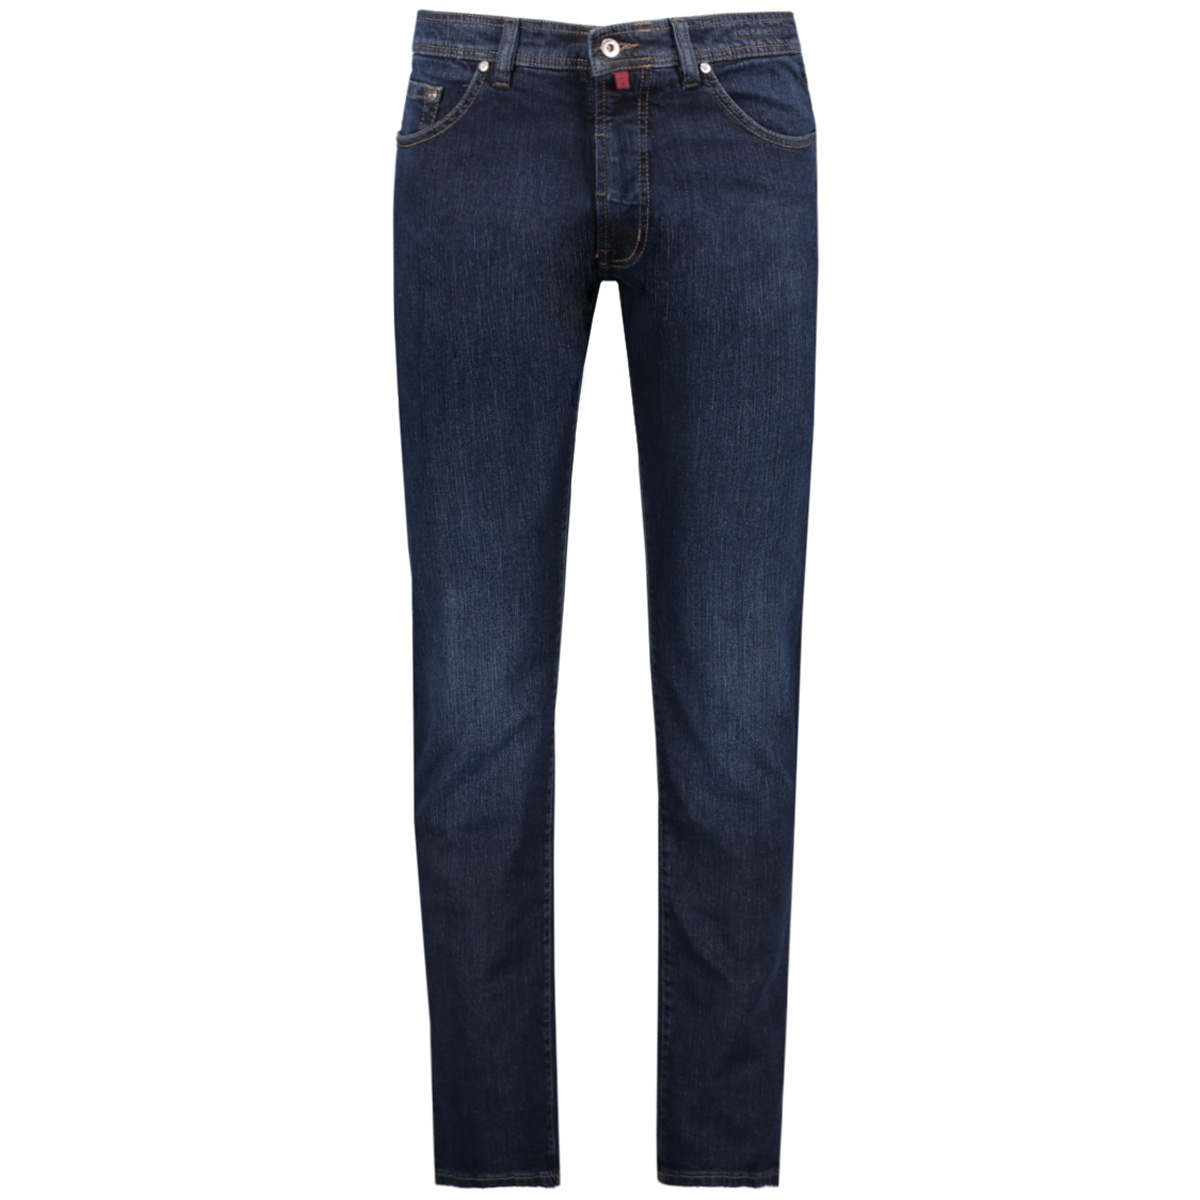 deauville 3196 pierre cardin jeans. Black Bedroom Furniture Sets. Home Design Ideas